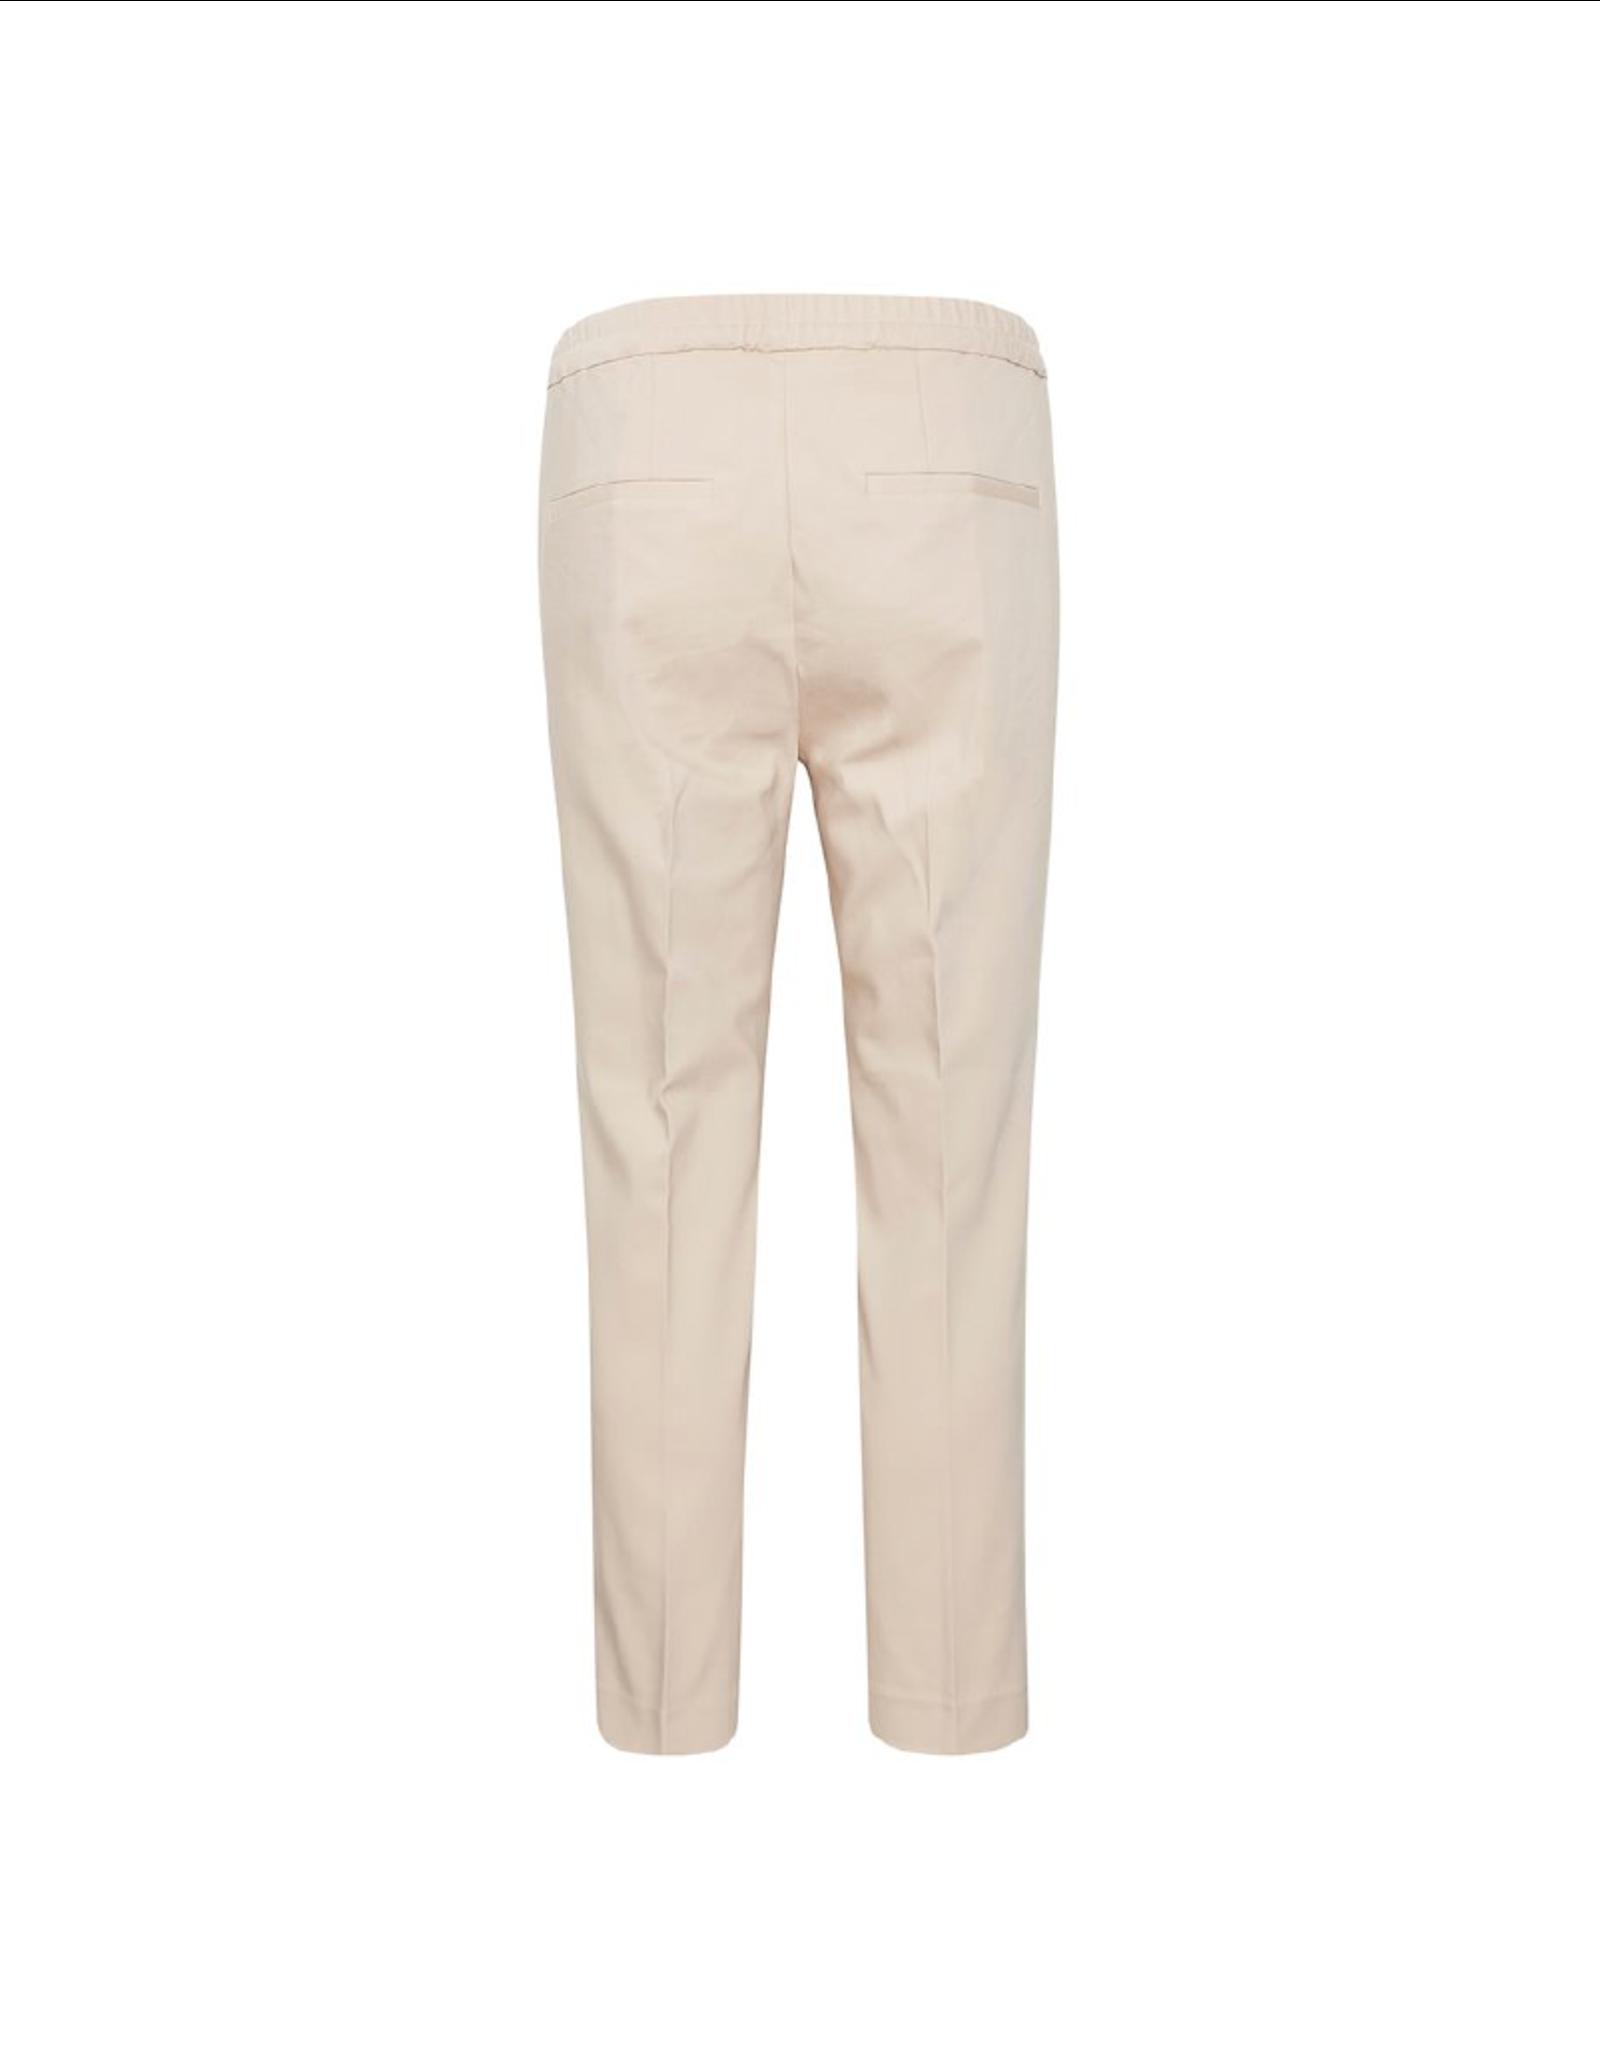 Inwear Zella Pull On Pant